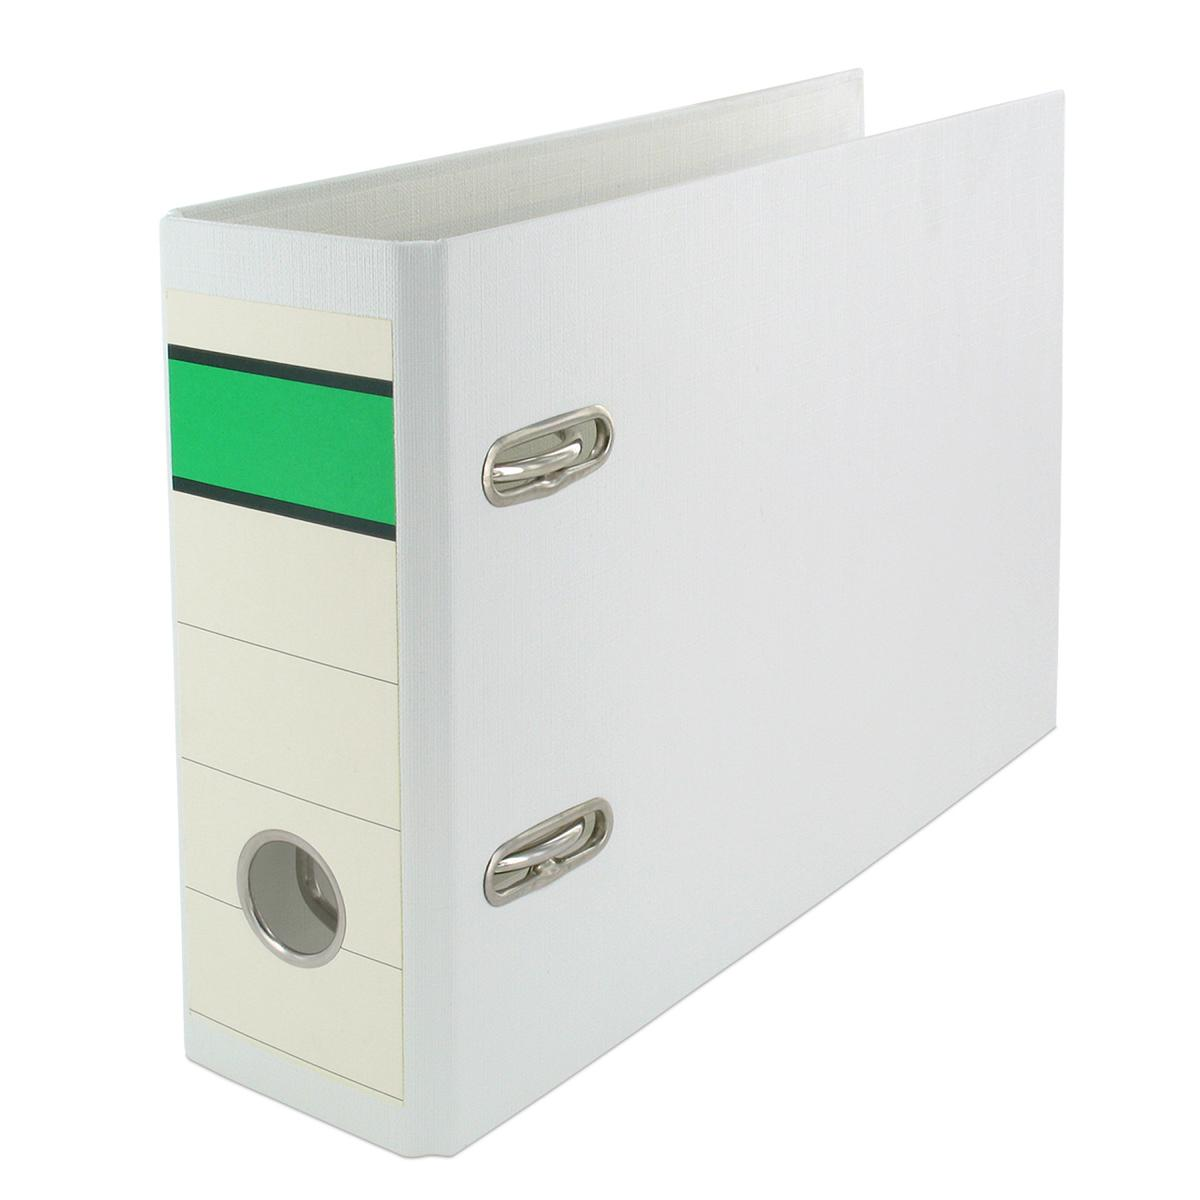 75mm je 1x blau 3x Ordner grün und weiß Farbe DIN A5